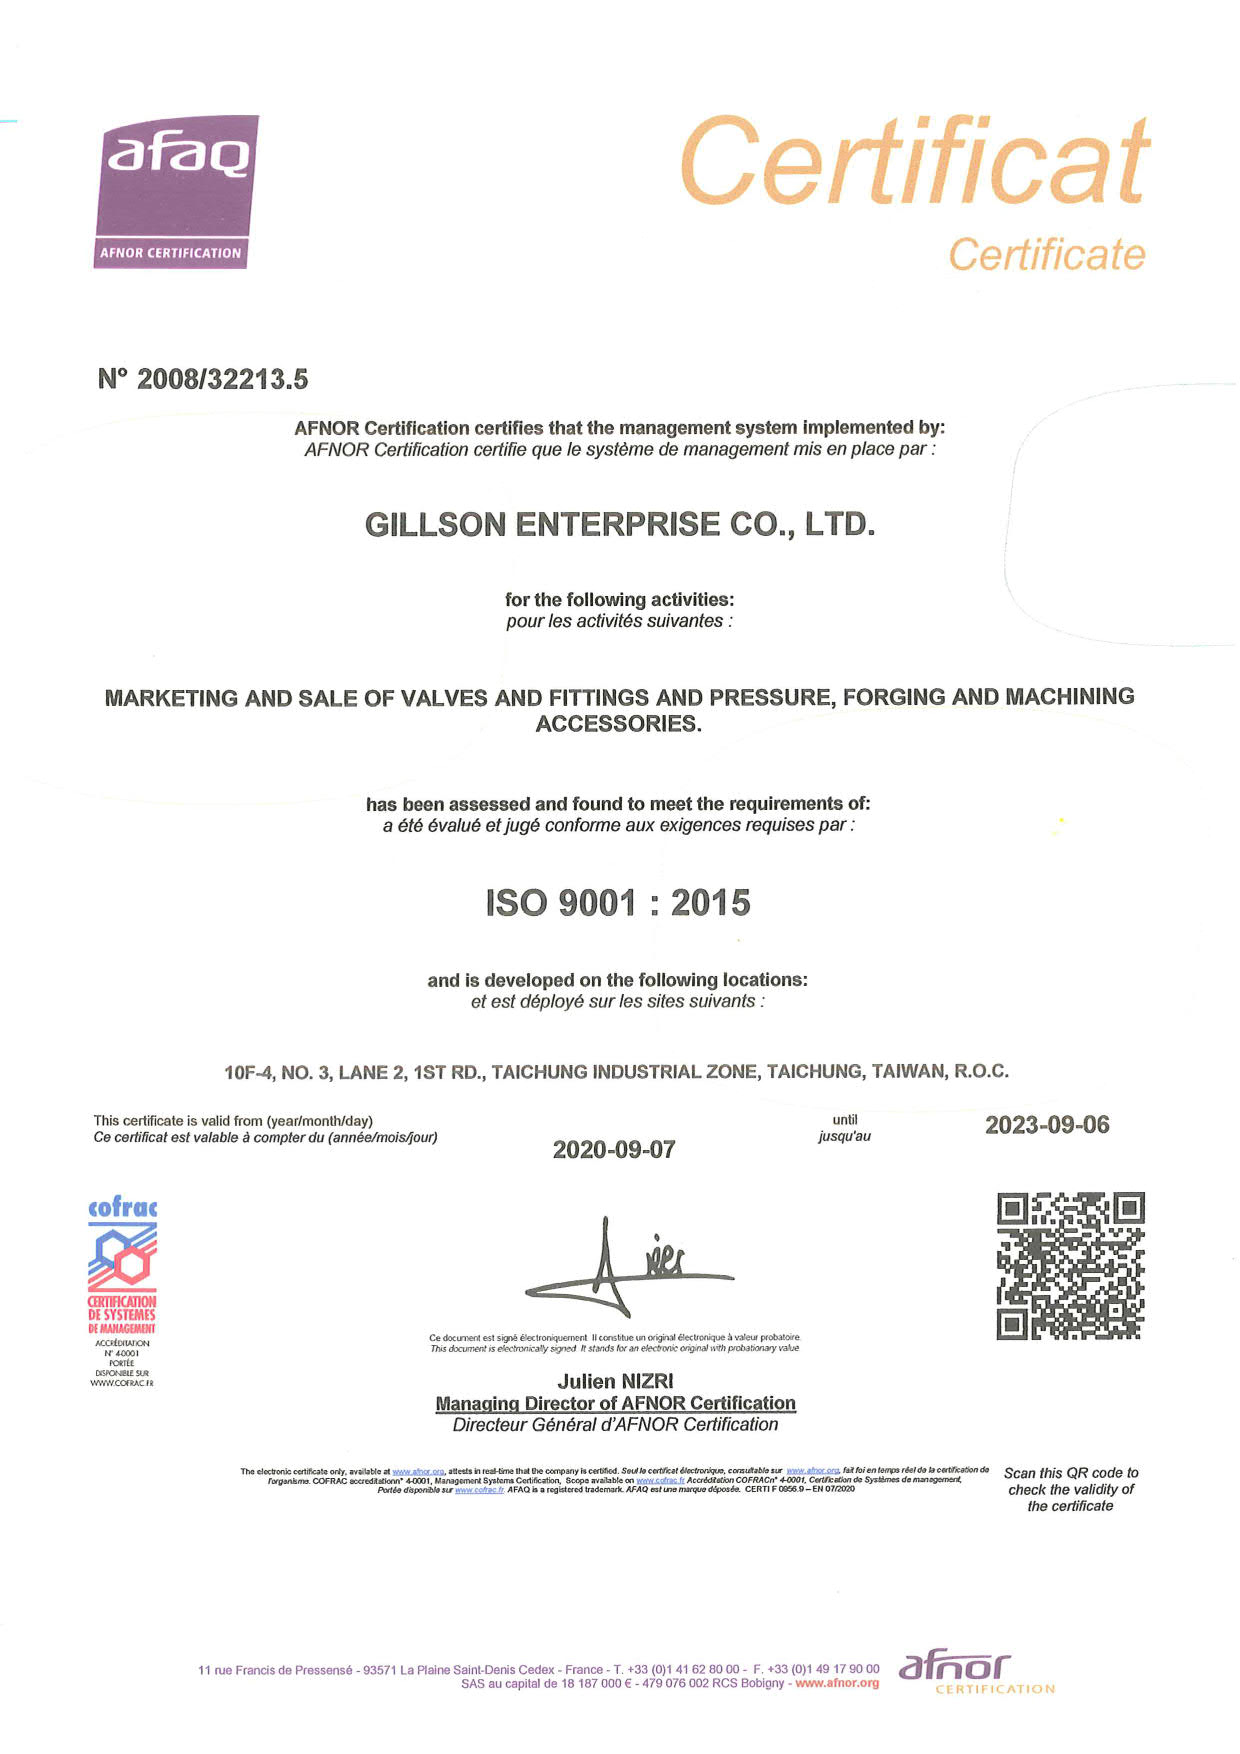 proimages/Certificate/ISO_CERTIFICATE_20200907-20230906_1.jpg